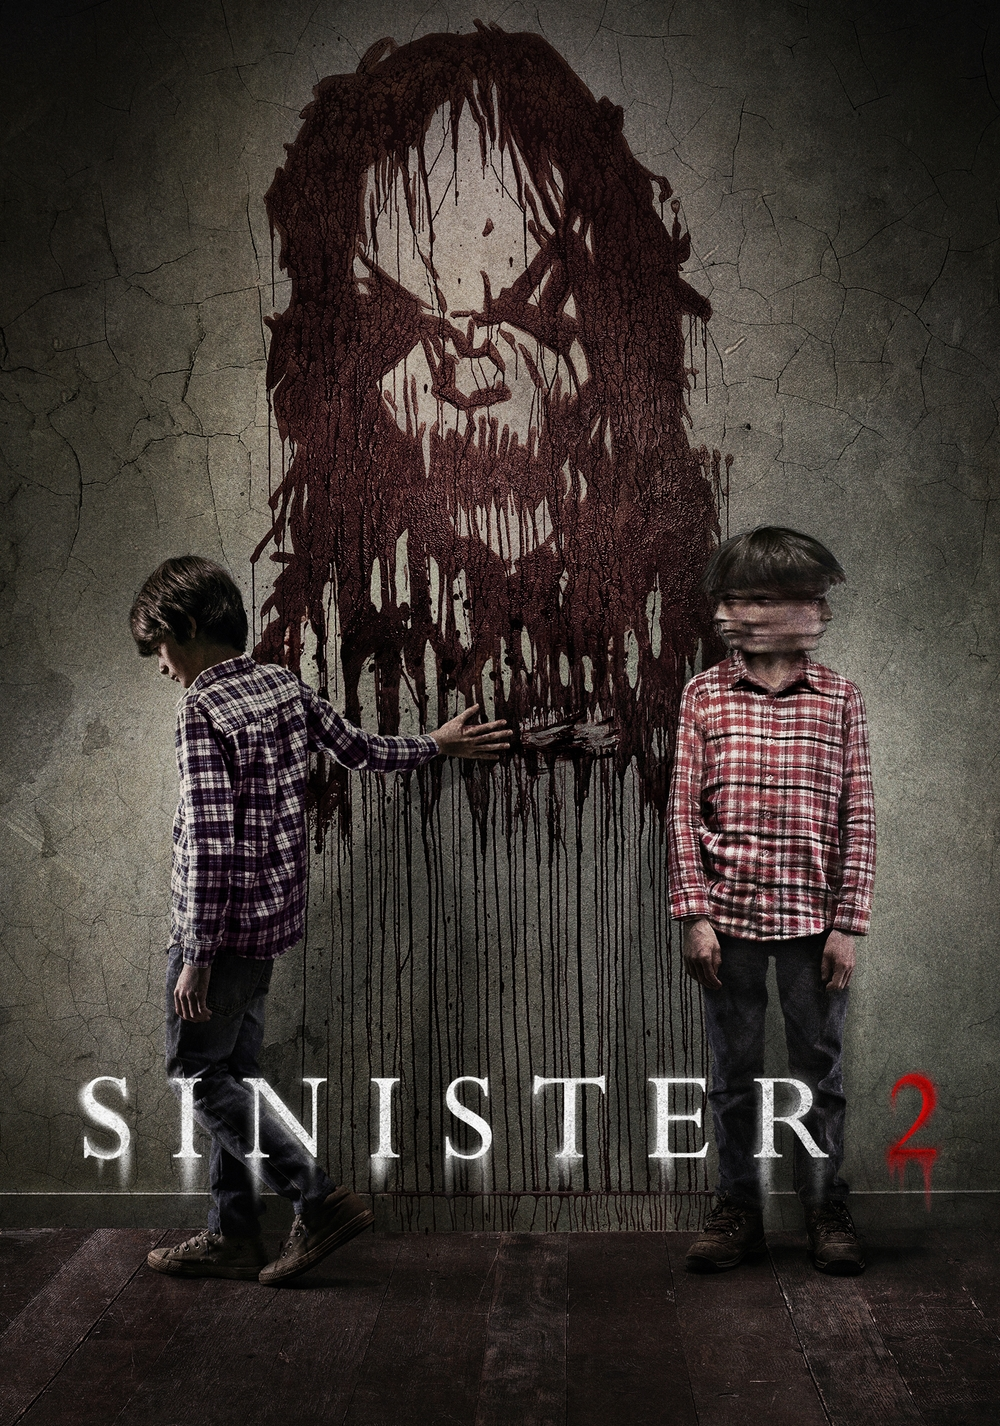 Sinister 2 | Movie fanart | fanart.tv